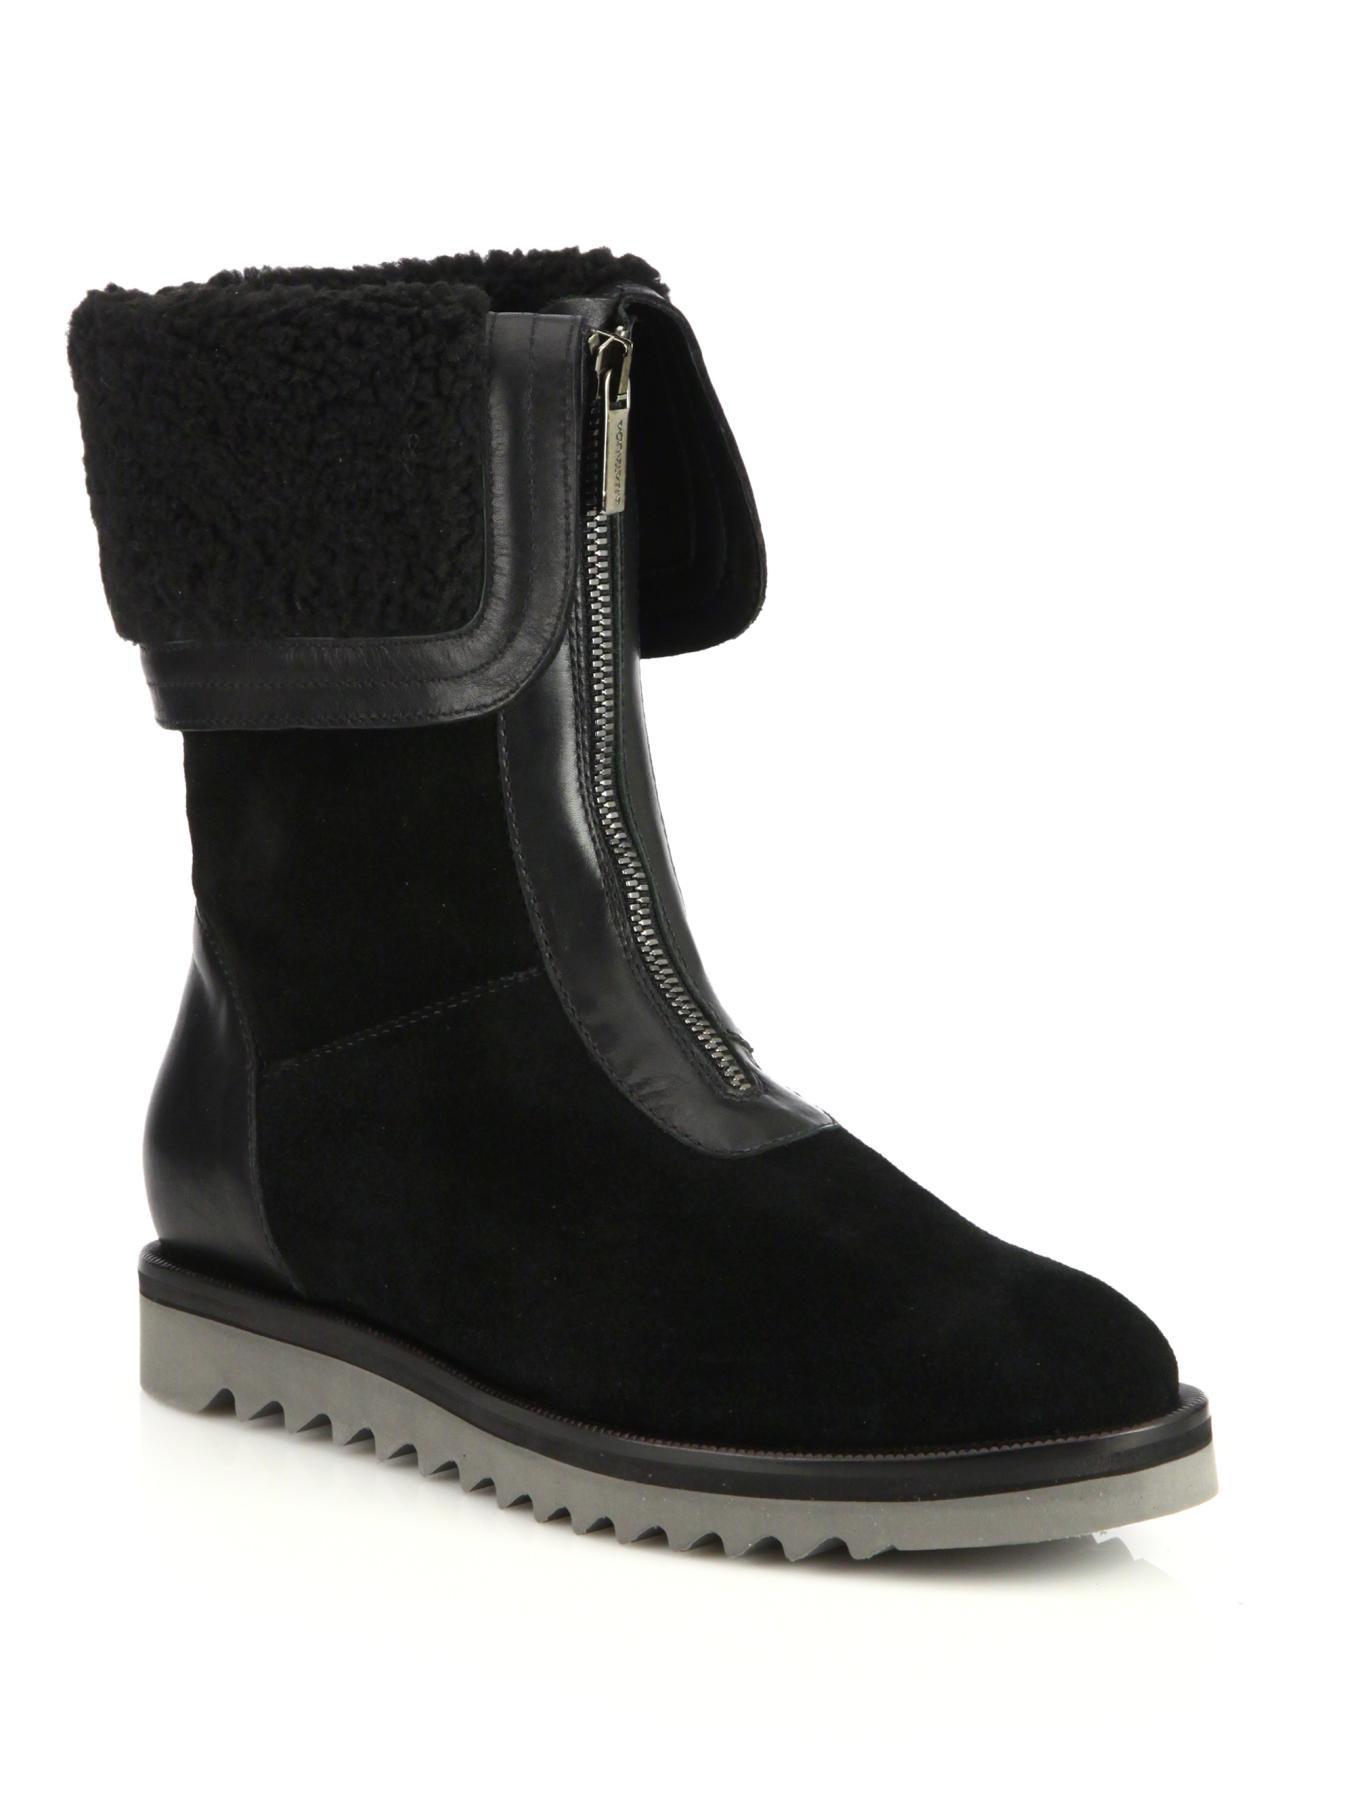 aquatalia suede faux fur cuff boots in black lyst